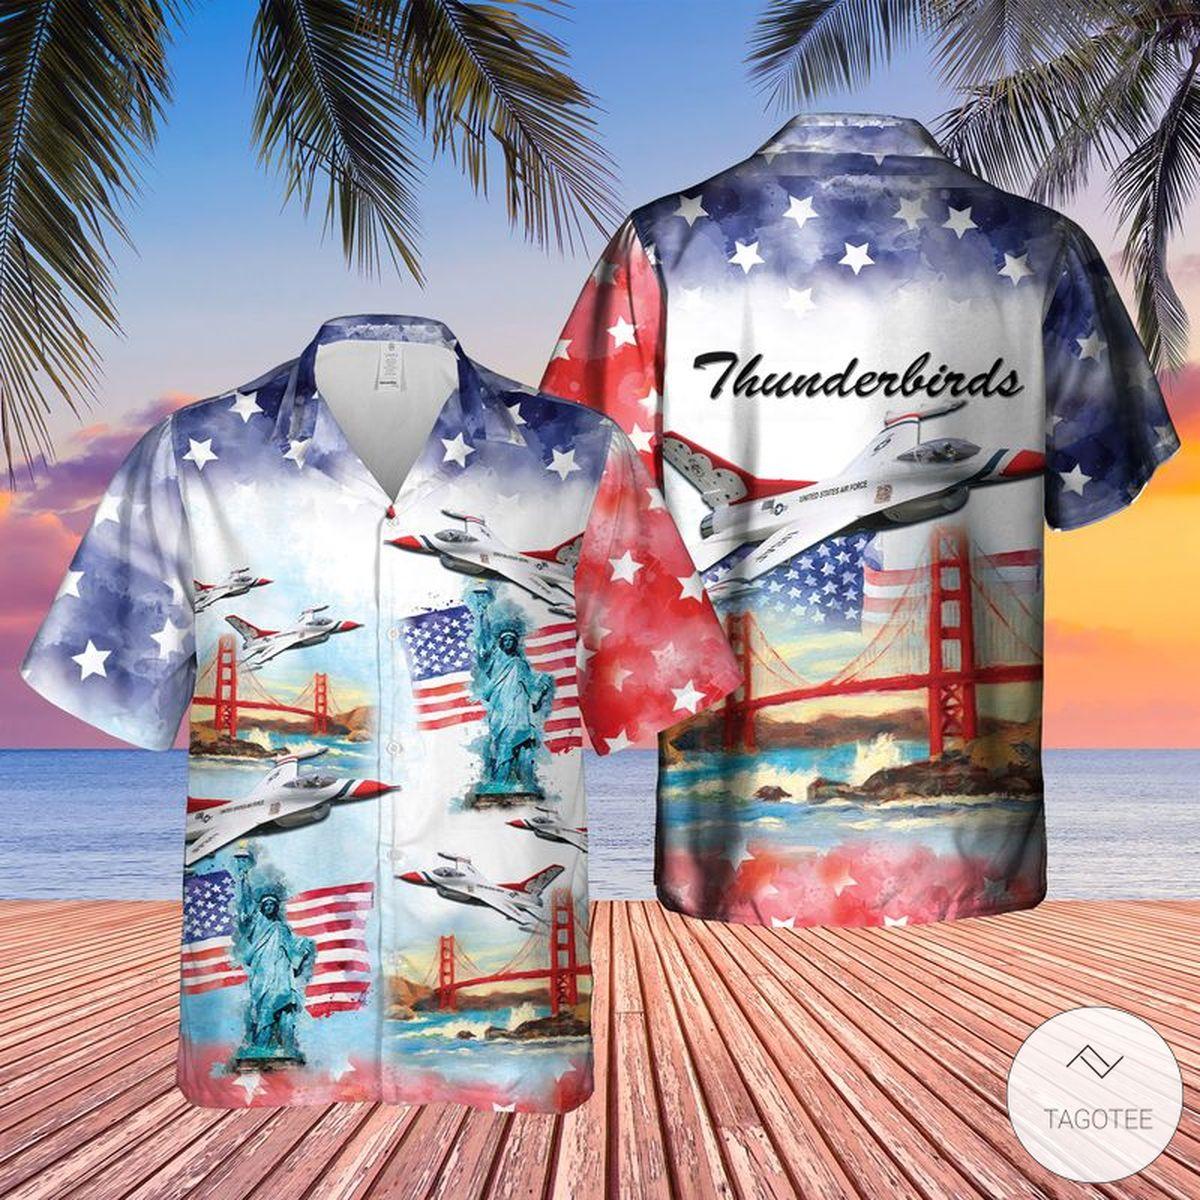 Thunderbirds USAF Air Show 4th of July Hawaiian Shirt, Beach Shorts